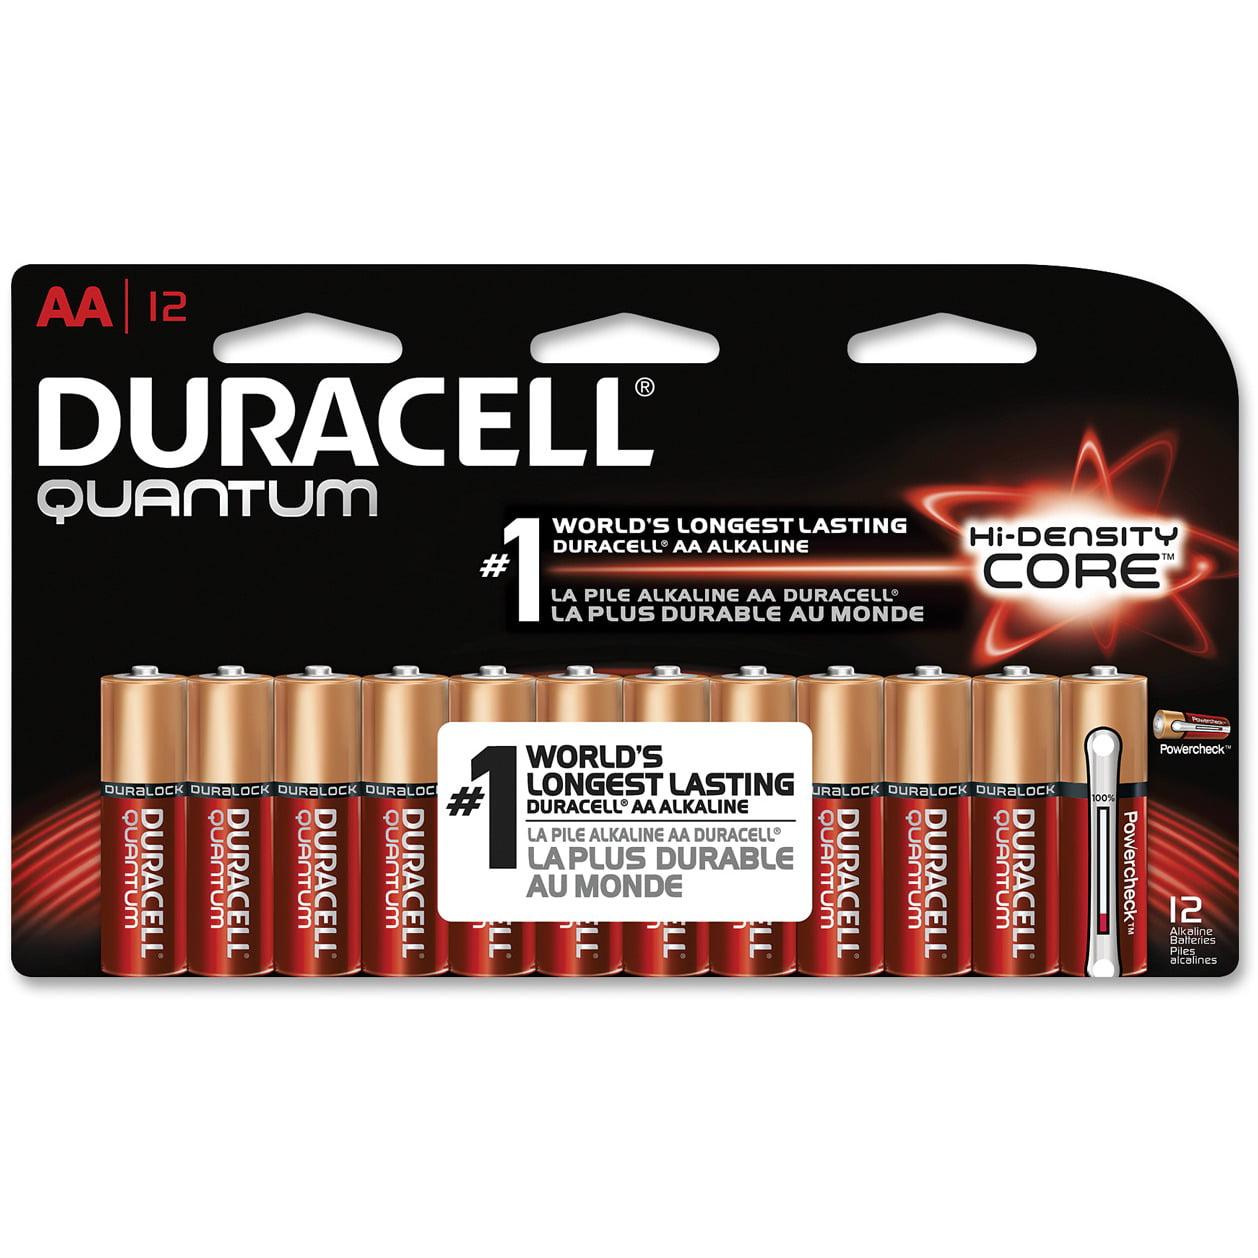 Duracell Quantum Advanced Alkaline AA Batteries,12 Count